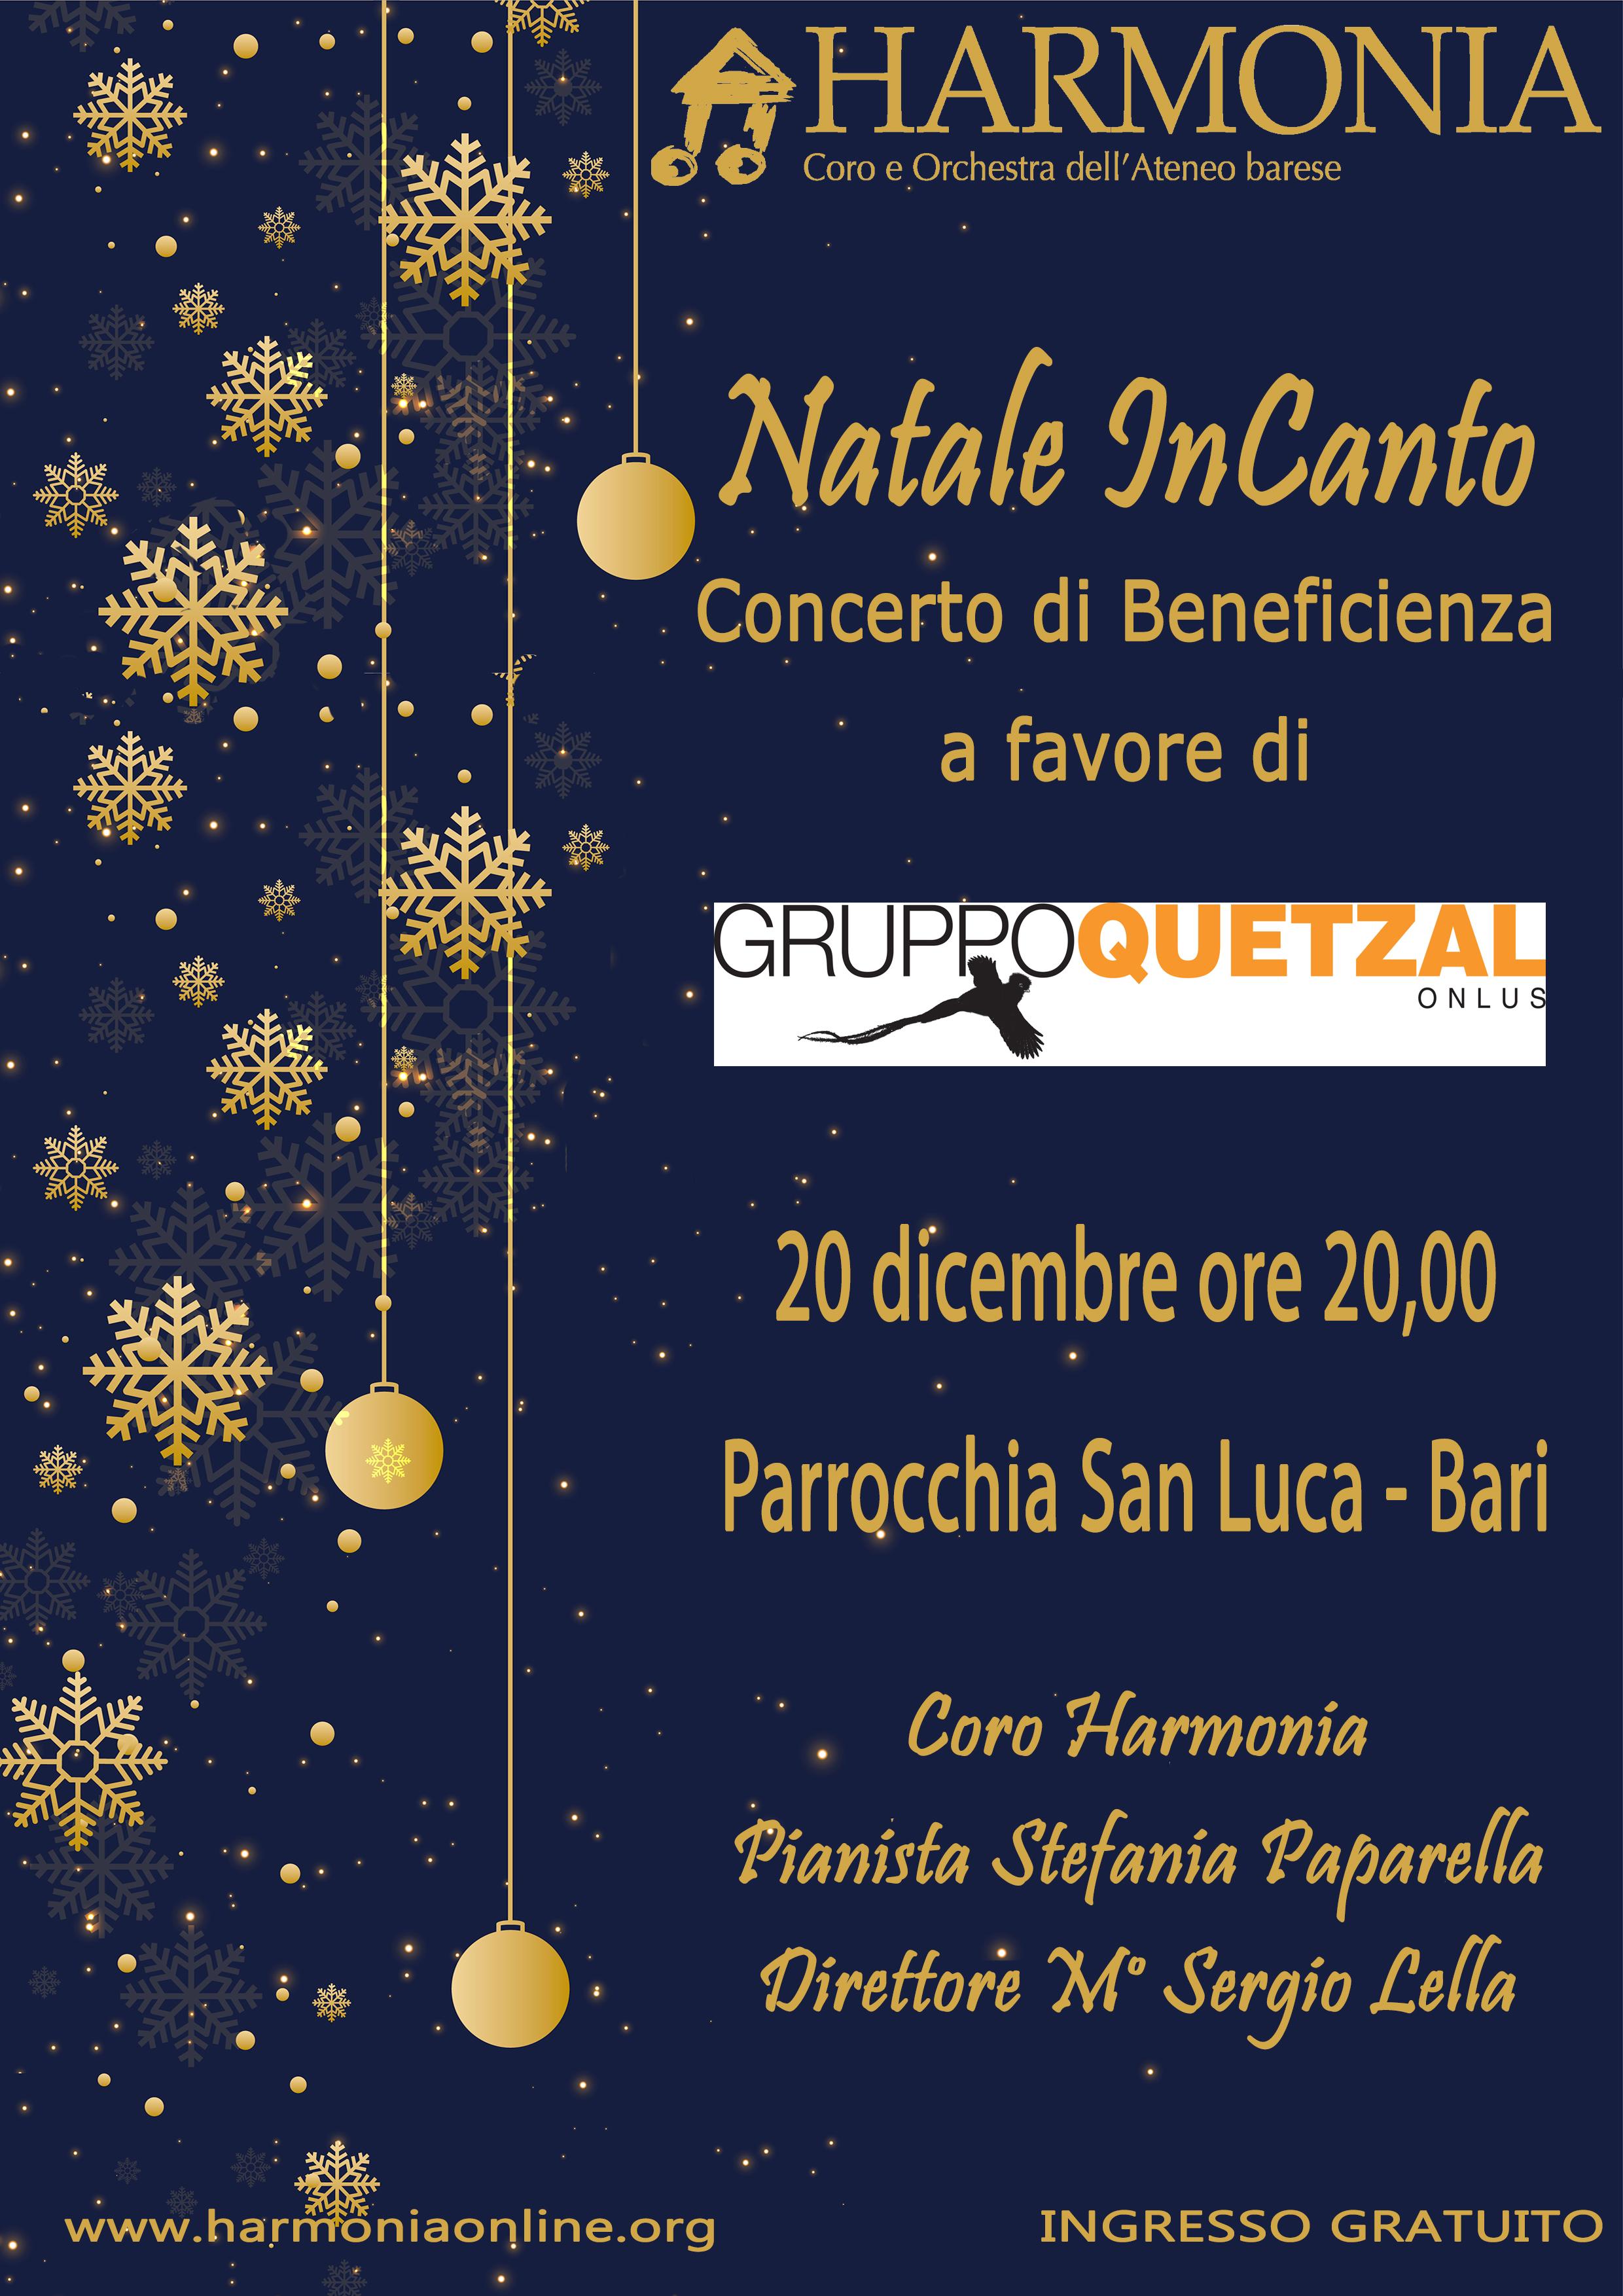 Natale InCanto @ Parrocchia San Luca - Bari